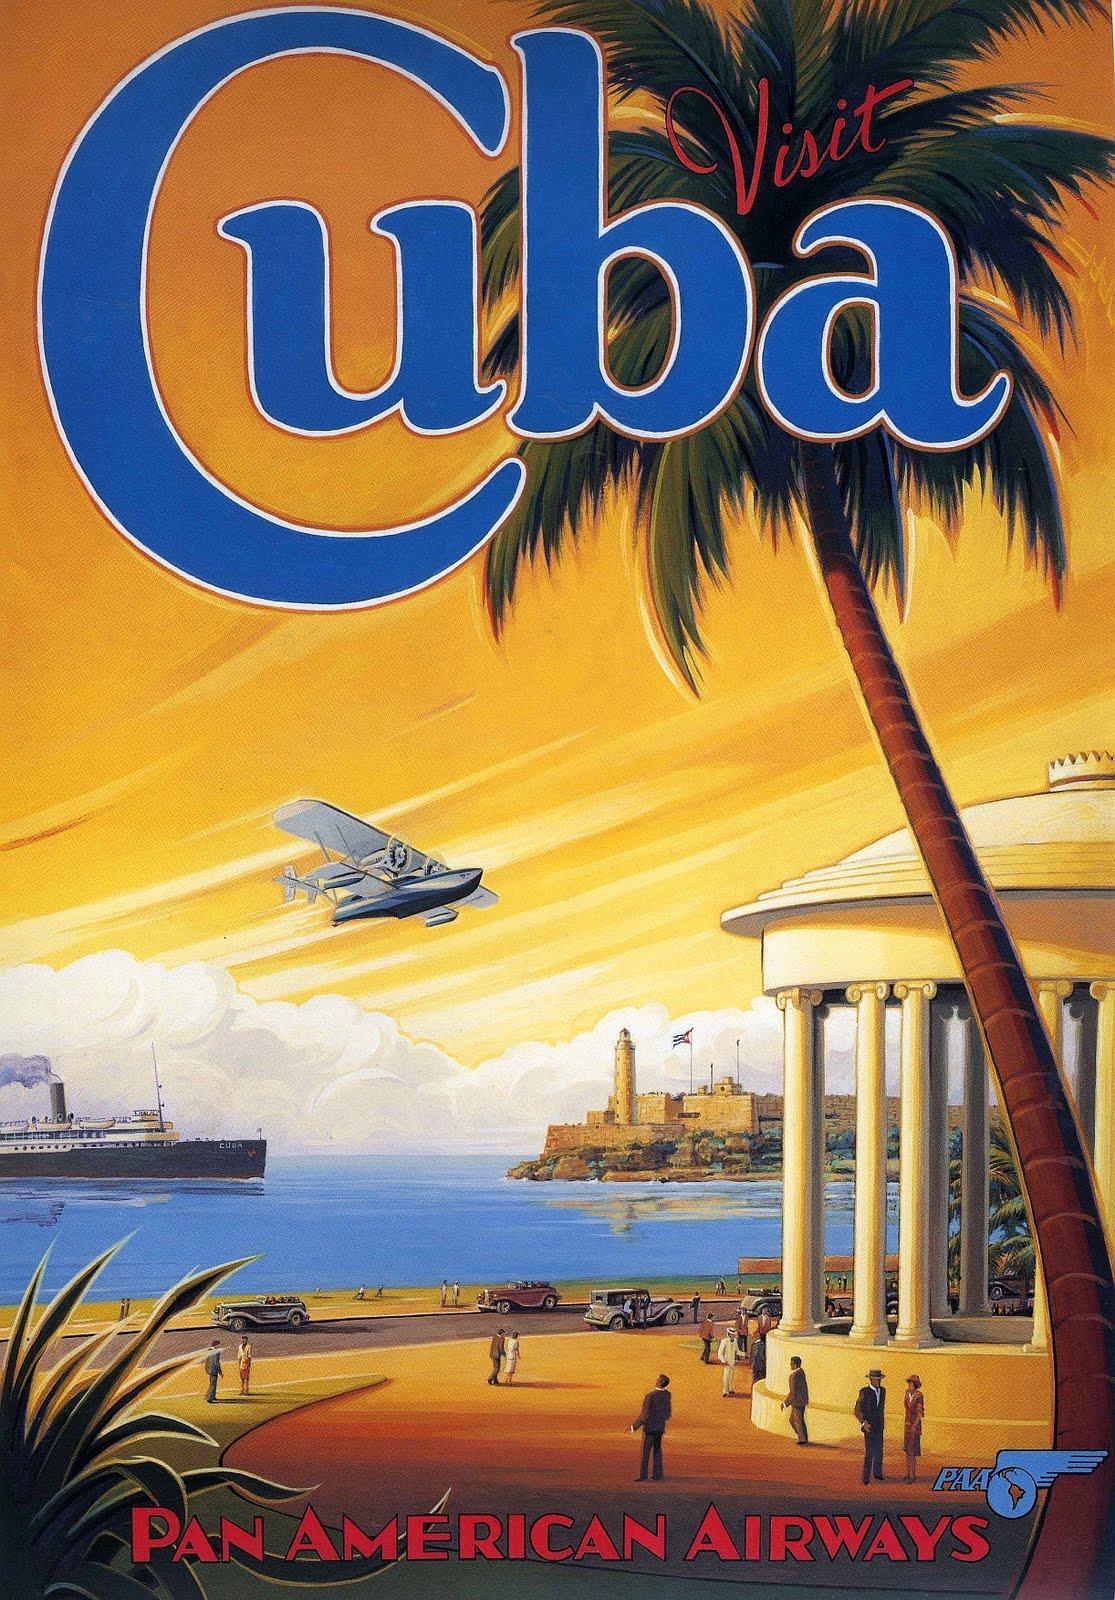 transpress nz: Pan Am poster - Visit Cuba